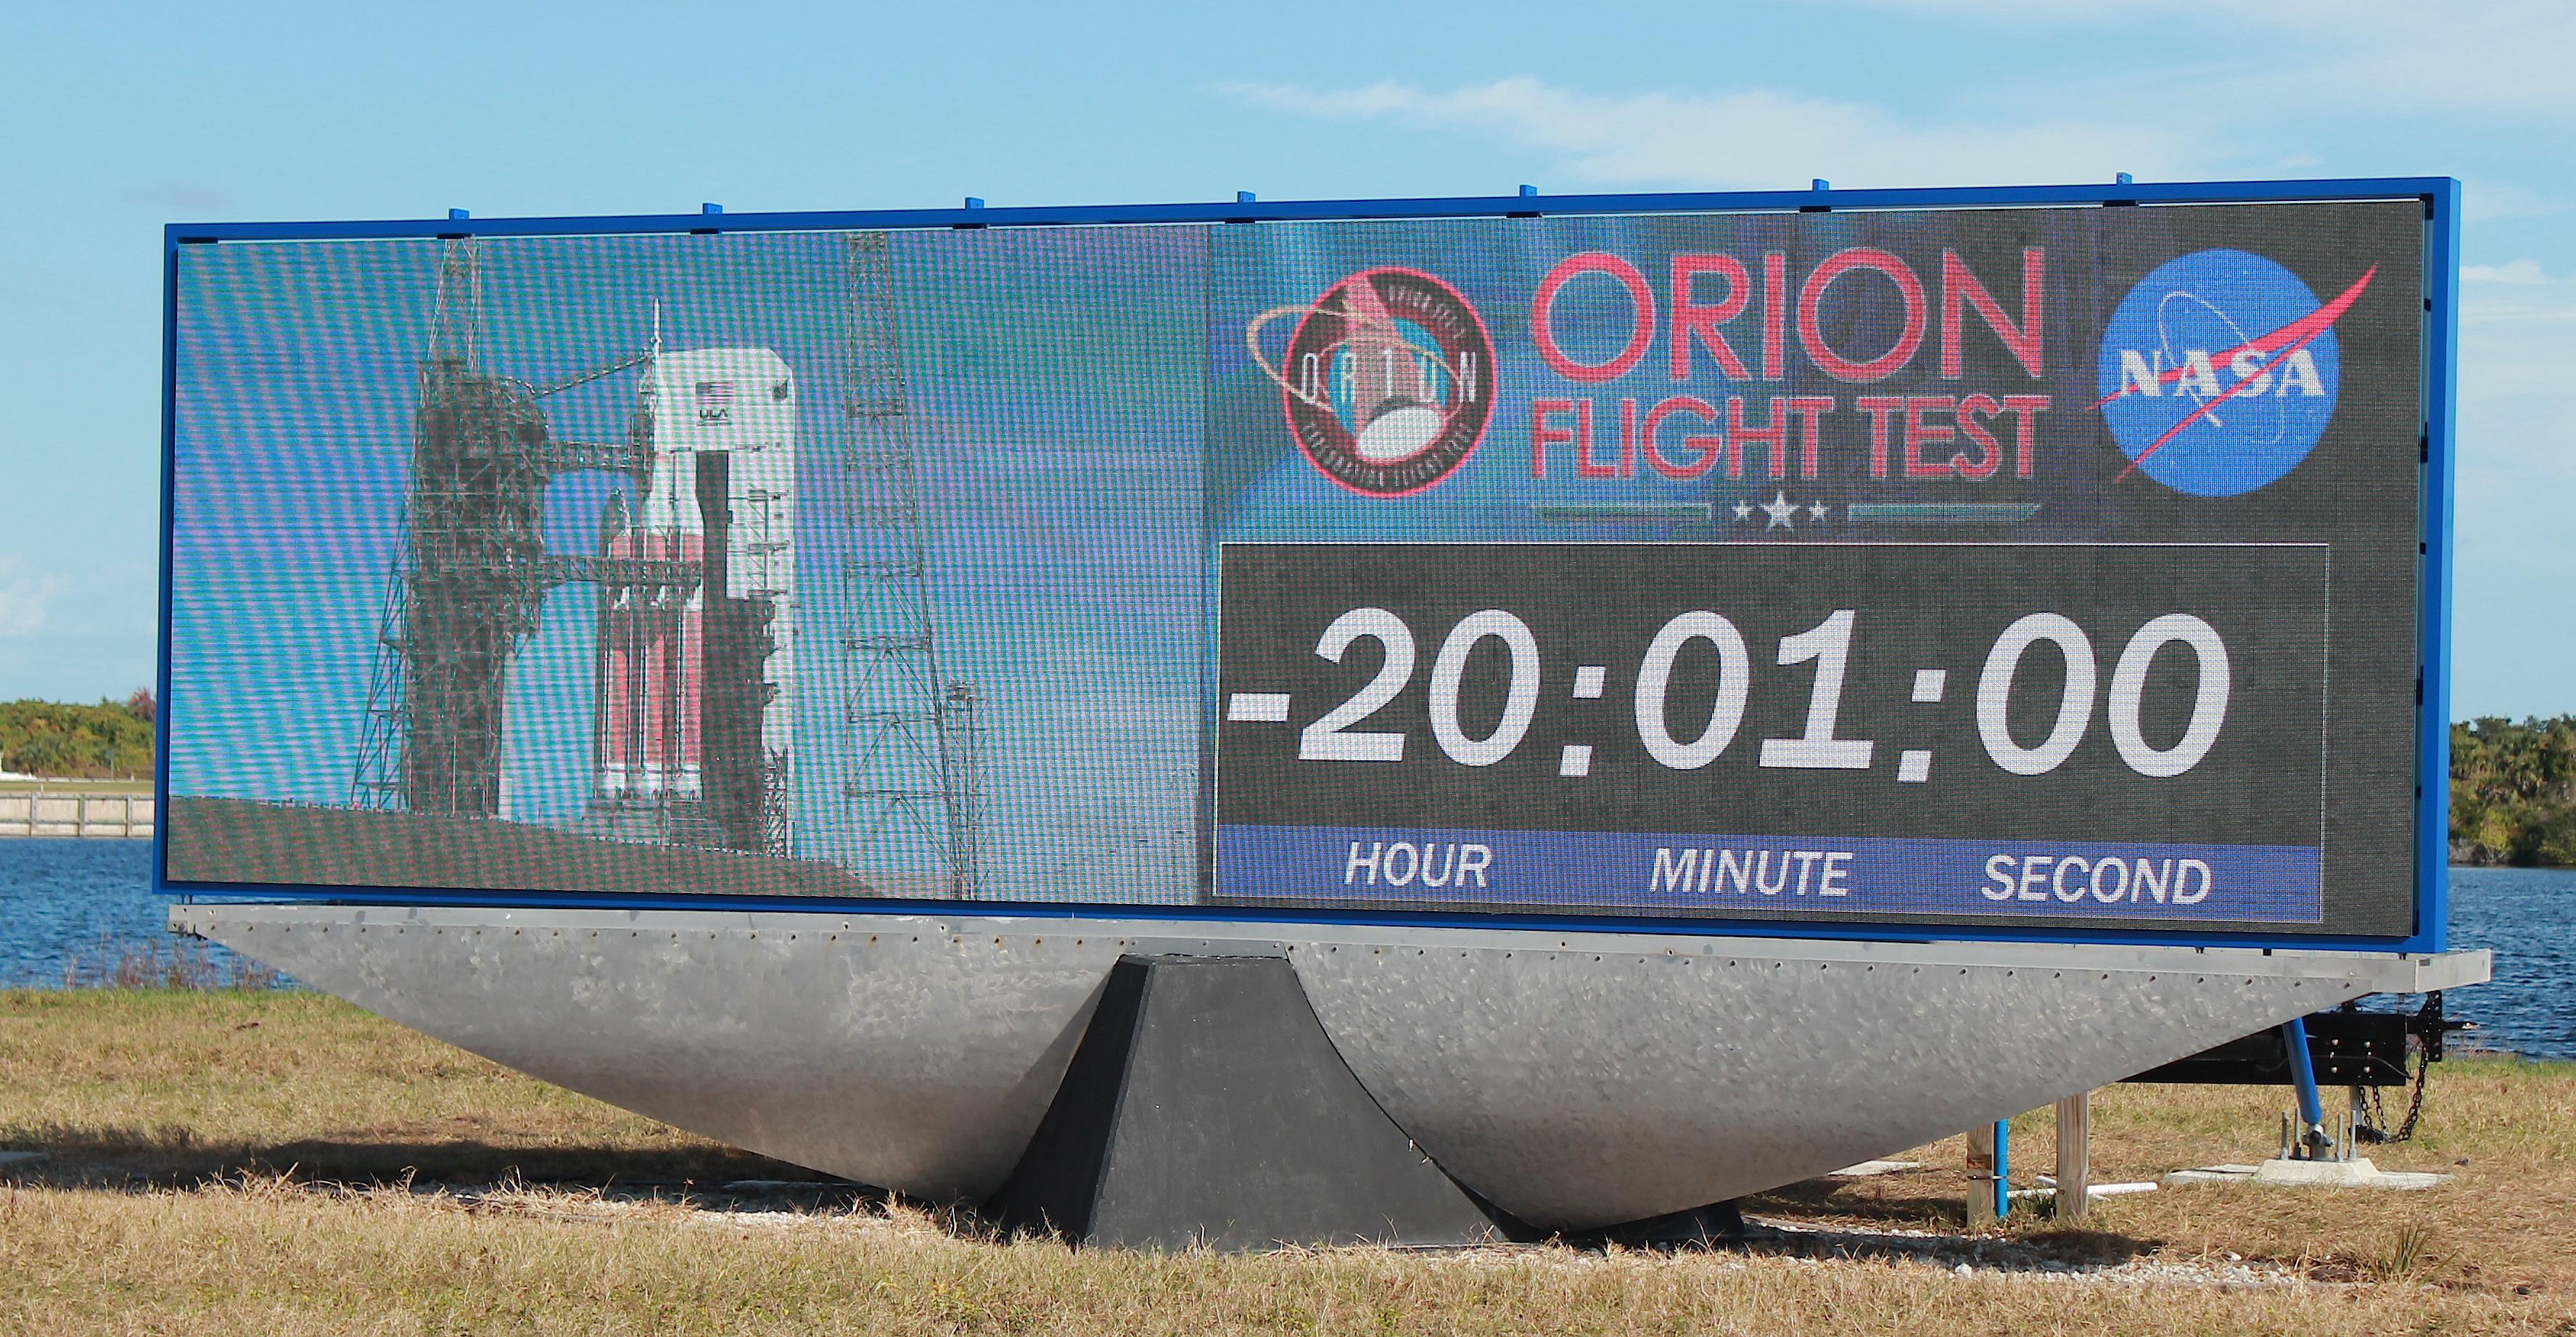 nasa hq countdown - photo #21